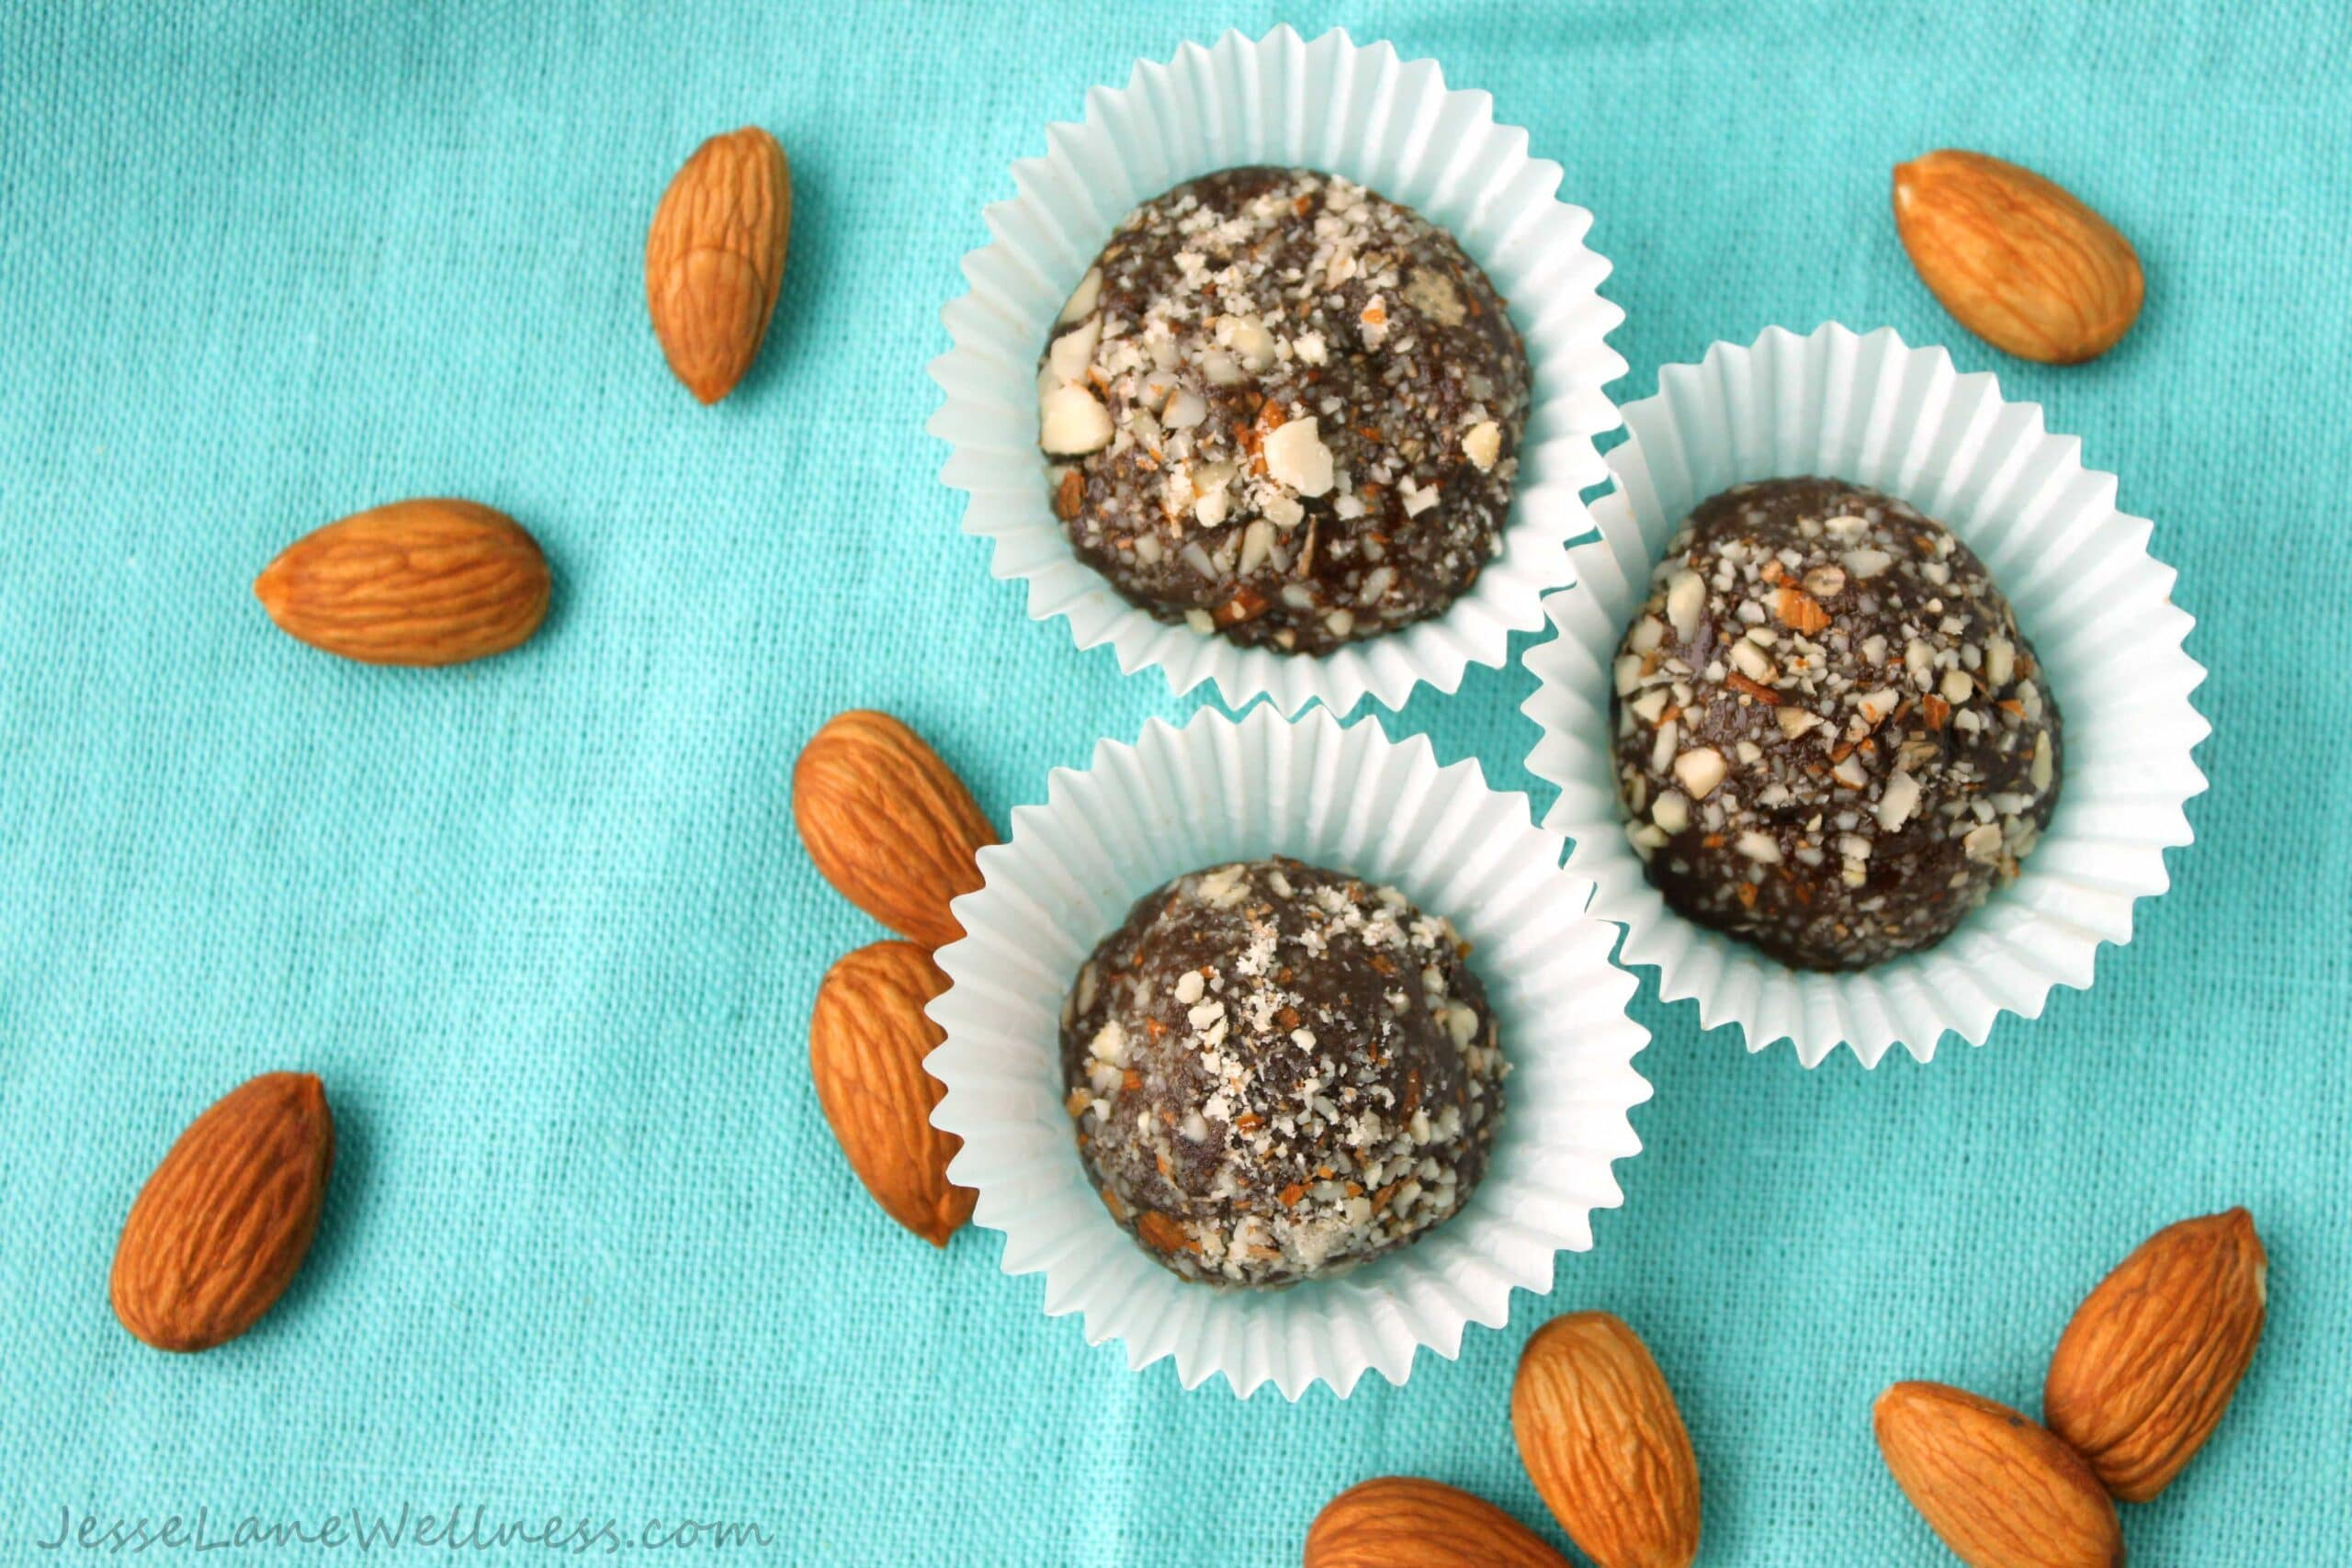 Vanilla Almond Protein Truffles by @JesseLWellness #glutenfree